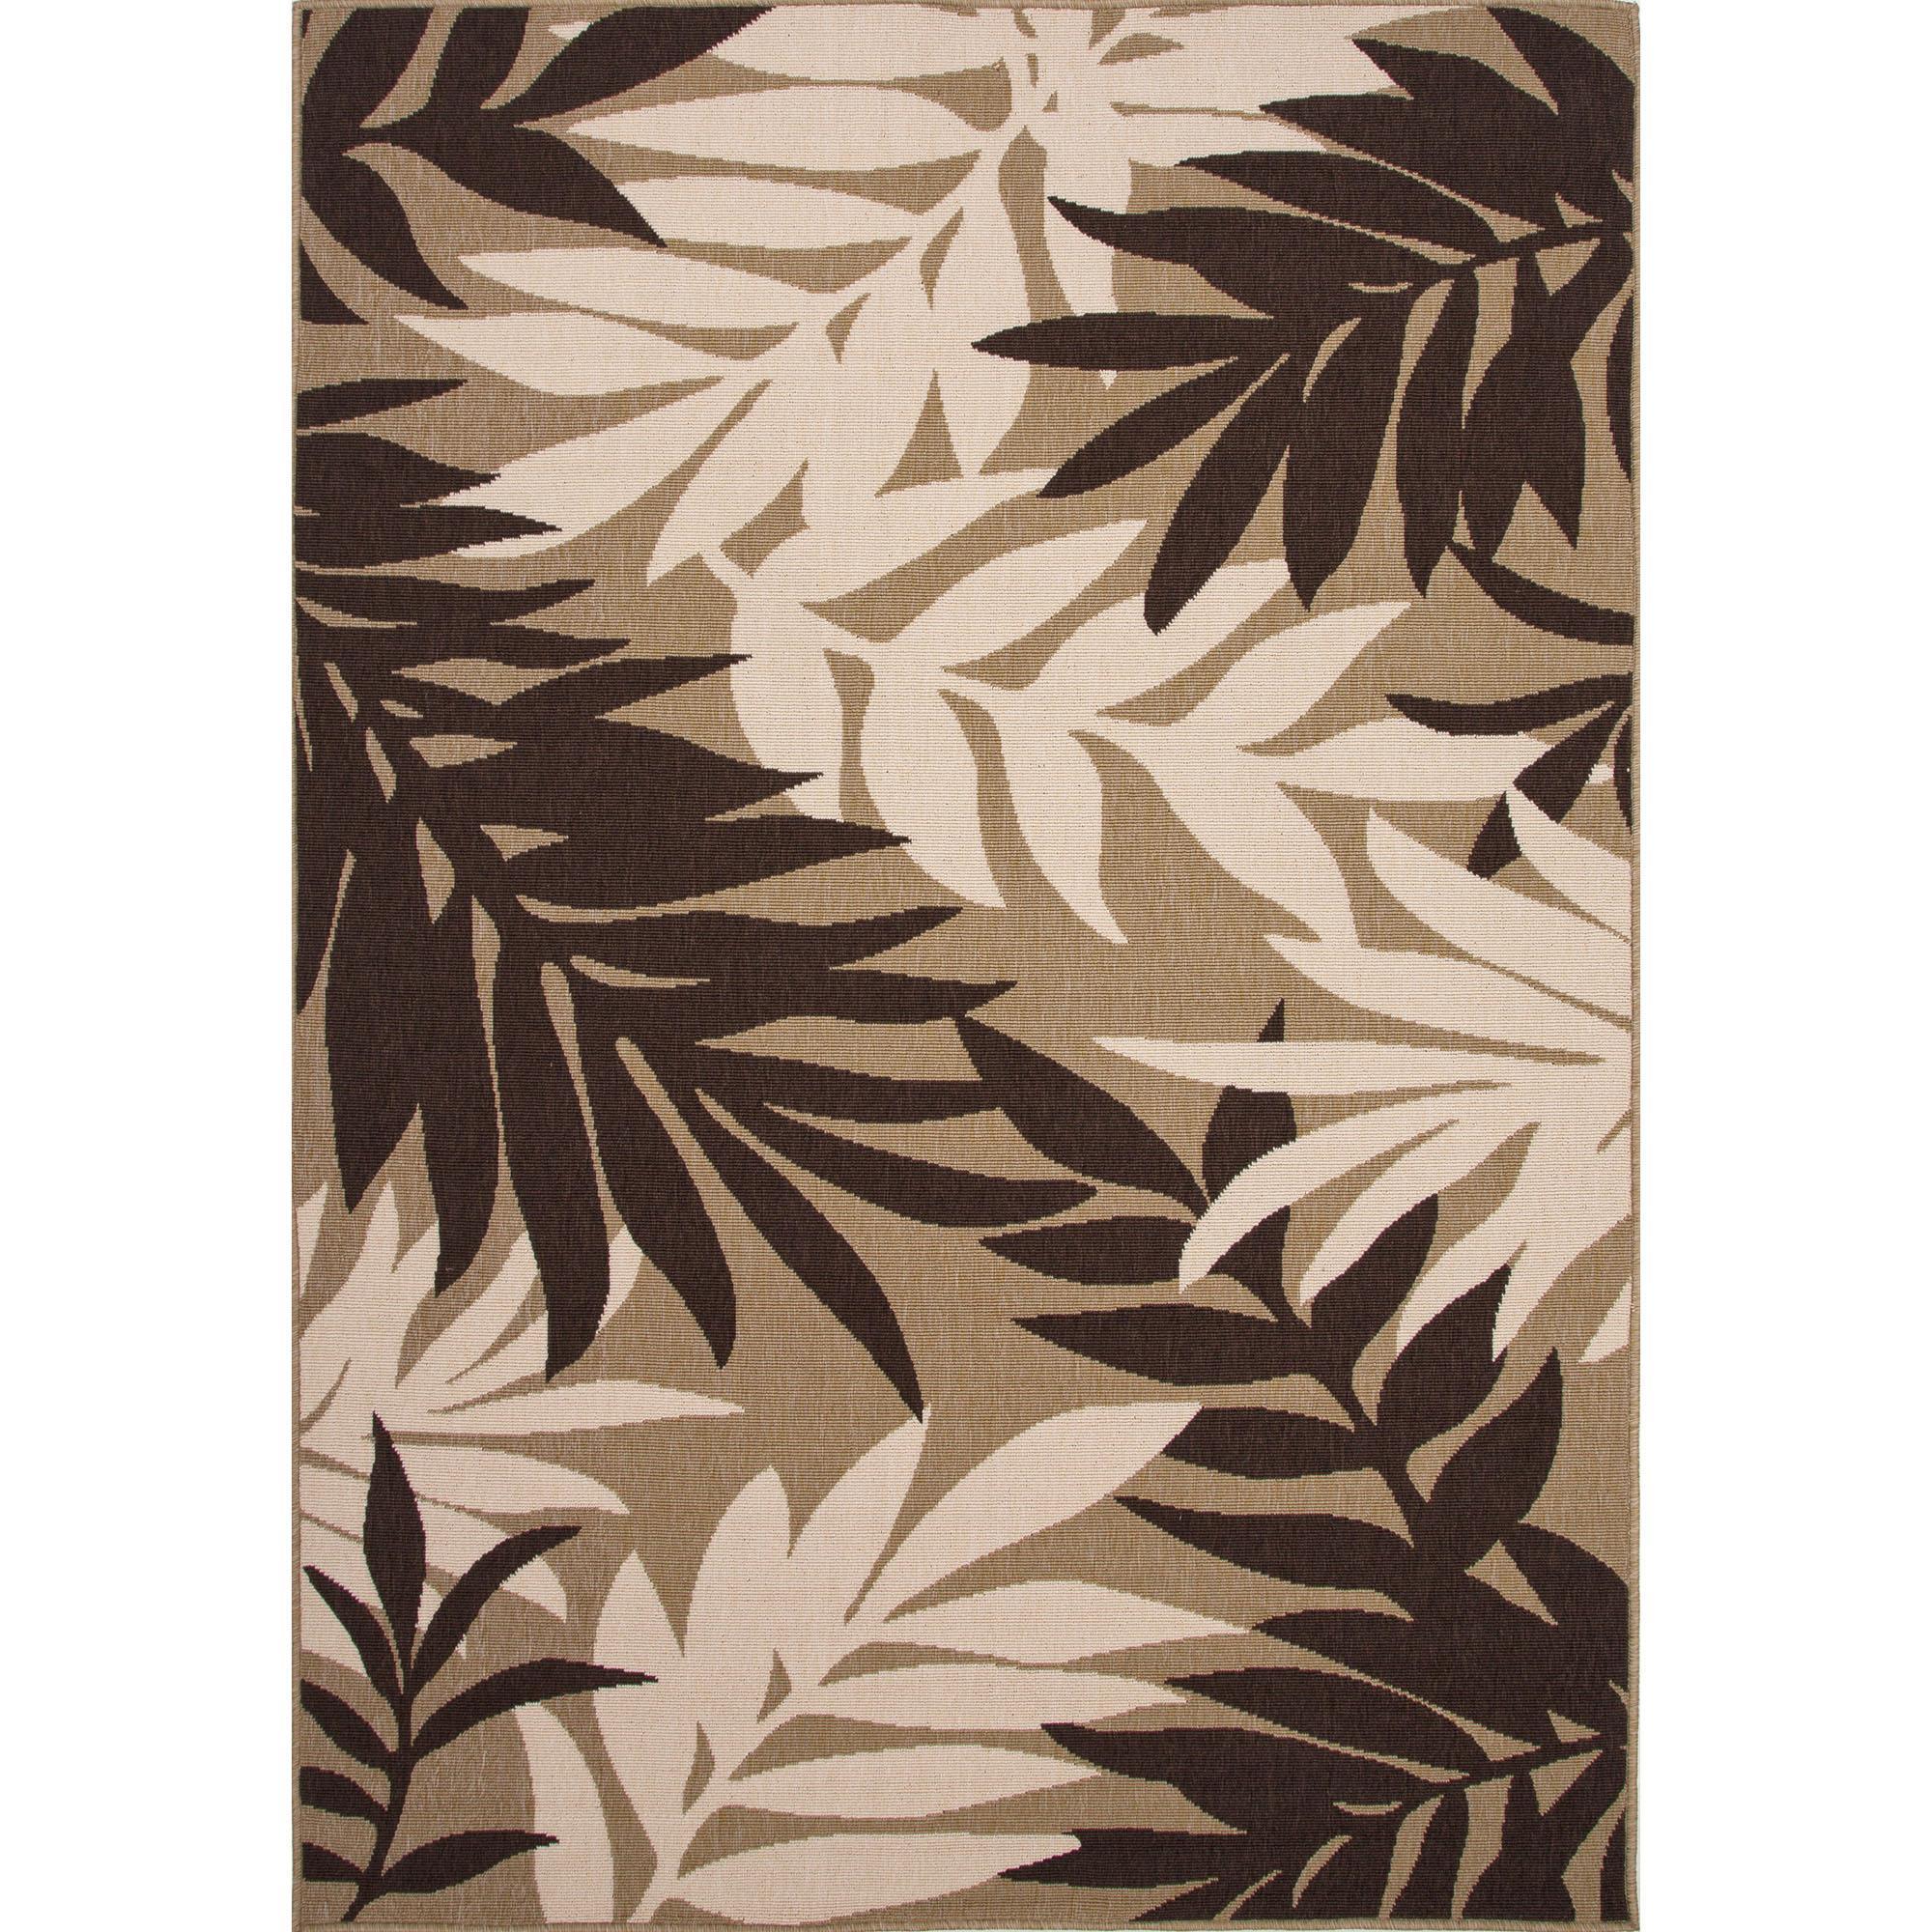 Bloom 5.3 x 7.6 Rug by JAIPUR Living at Sprintz Furniture